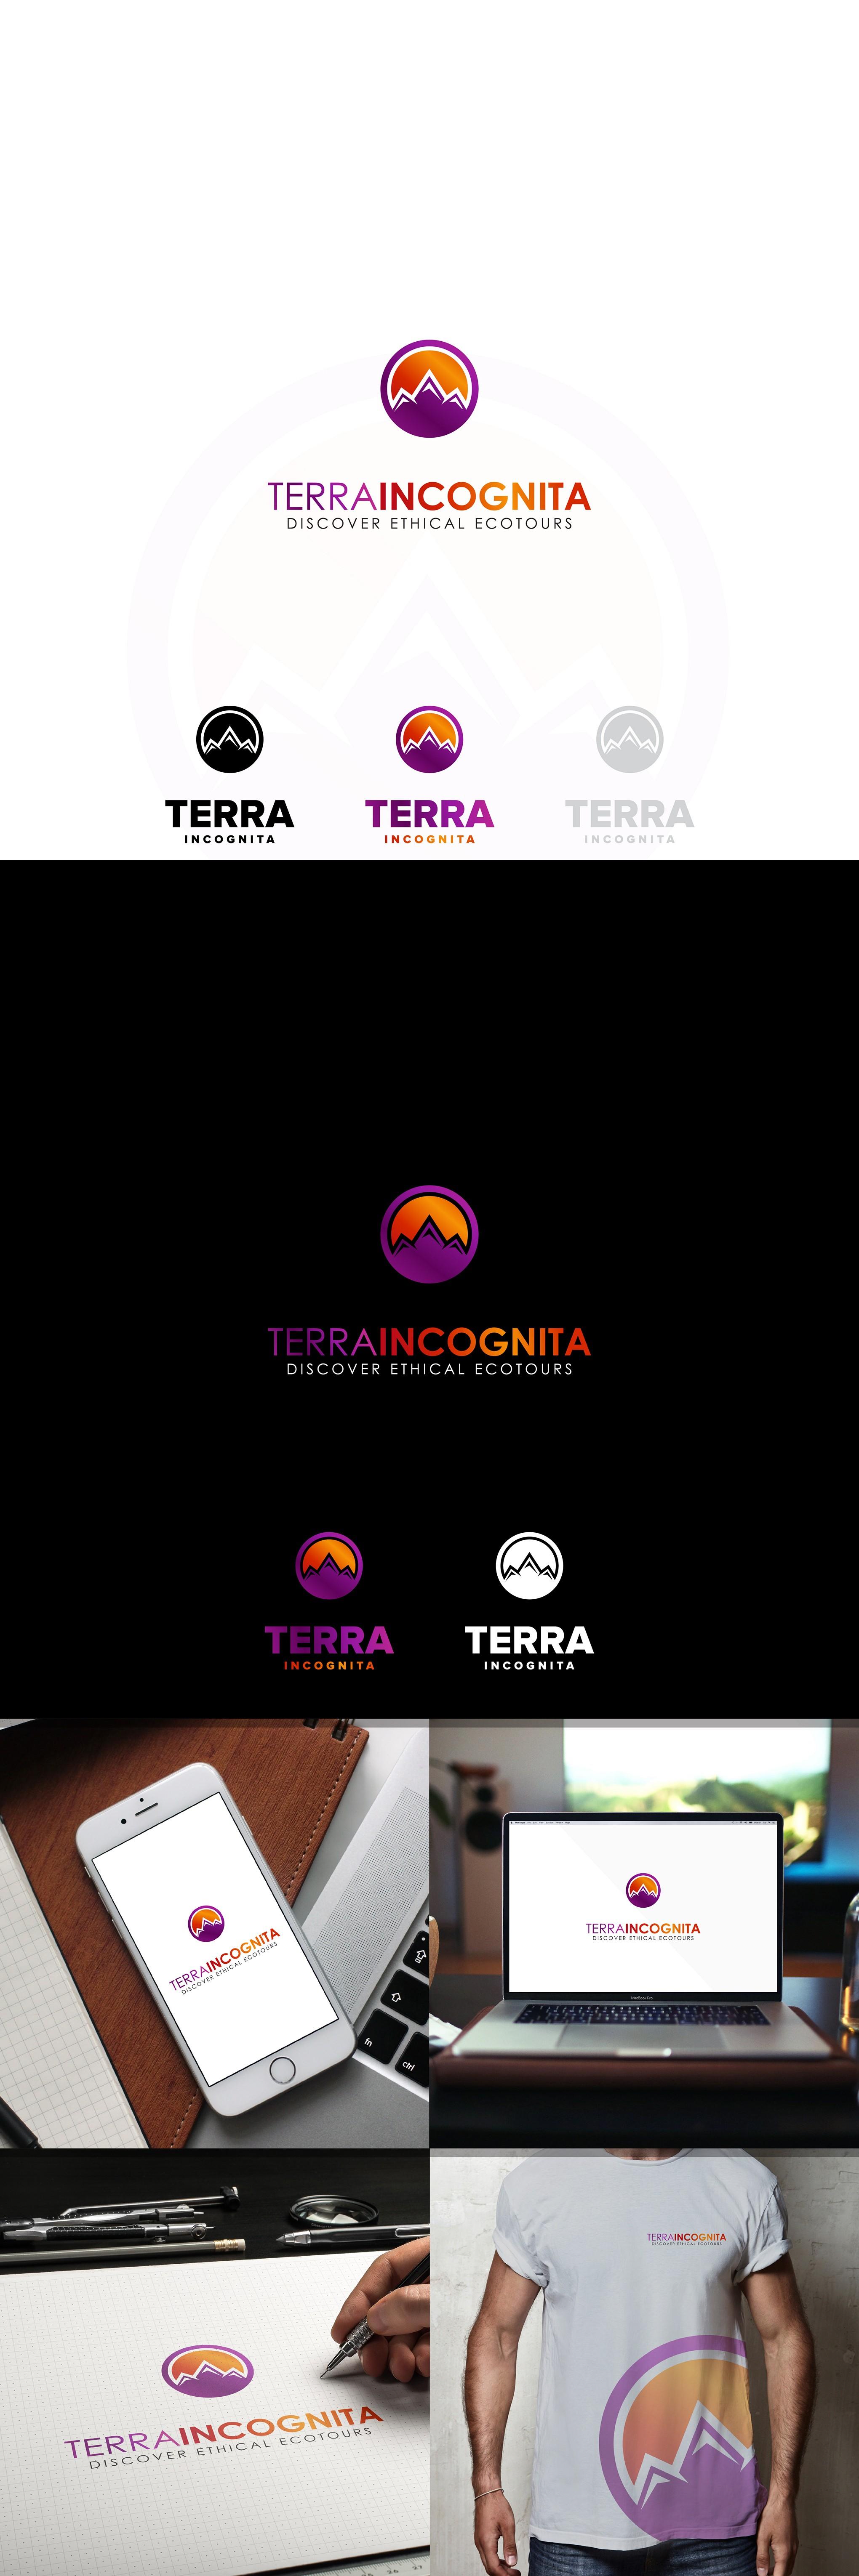 Logo for a new social enterprise that promotes ecotourism